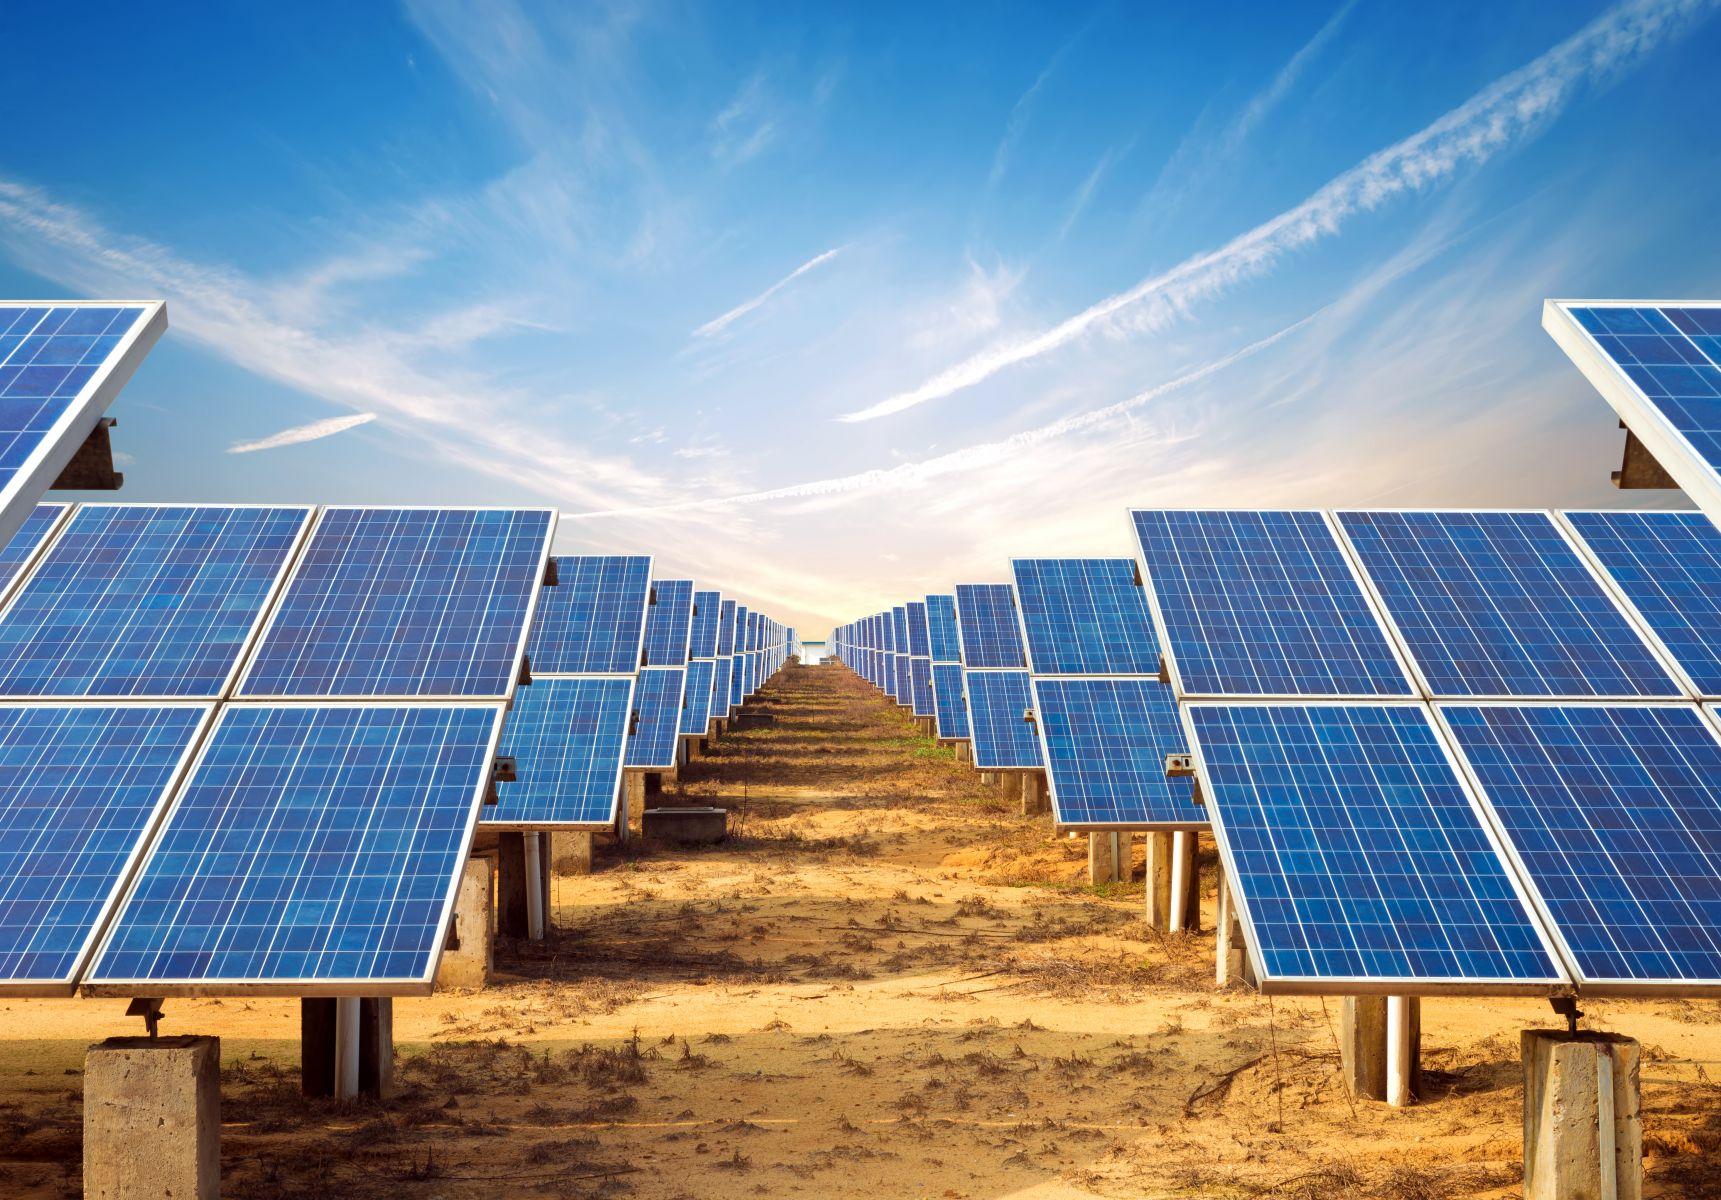 First Solar降至賣出!高盛:太陽能模組報價恐跌30%